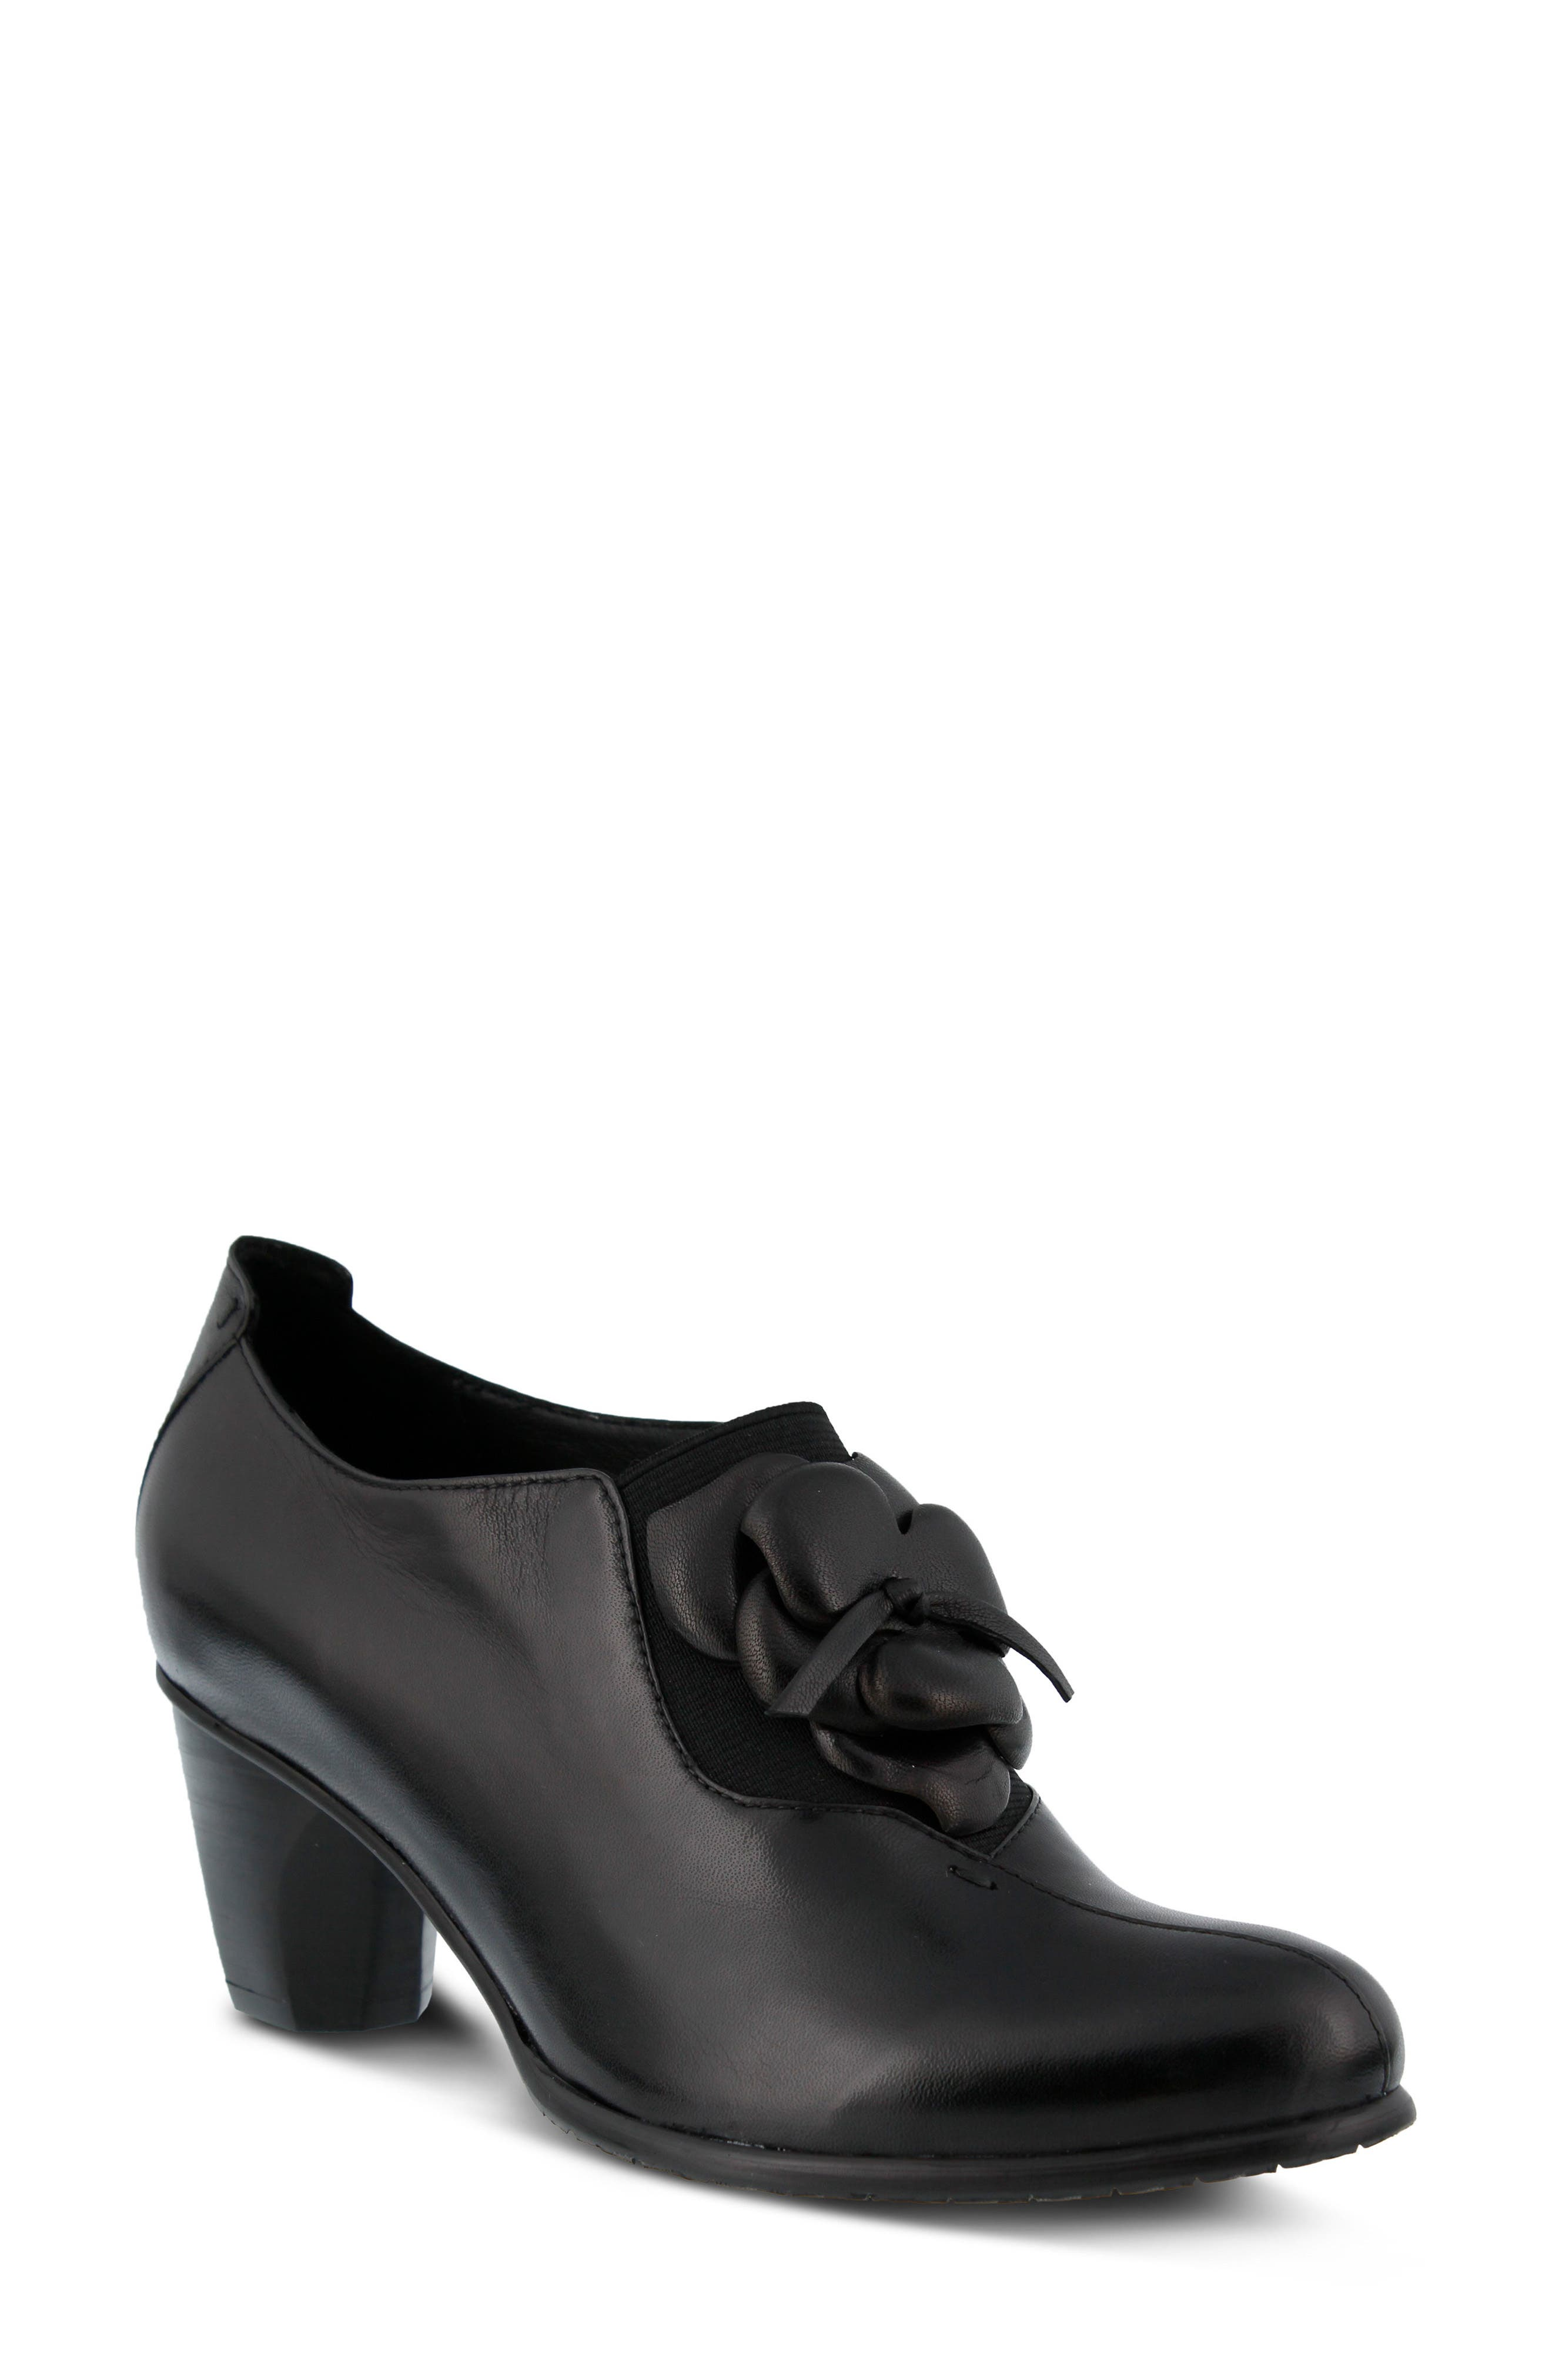 Spring Step Evelina Pump - Black